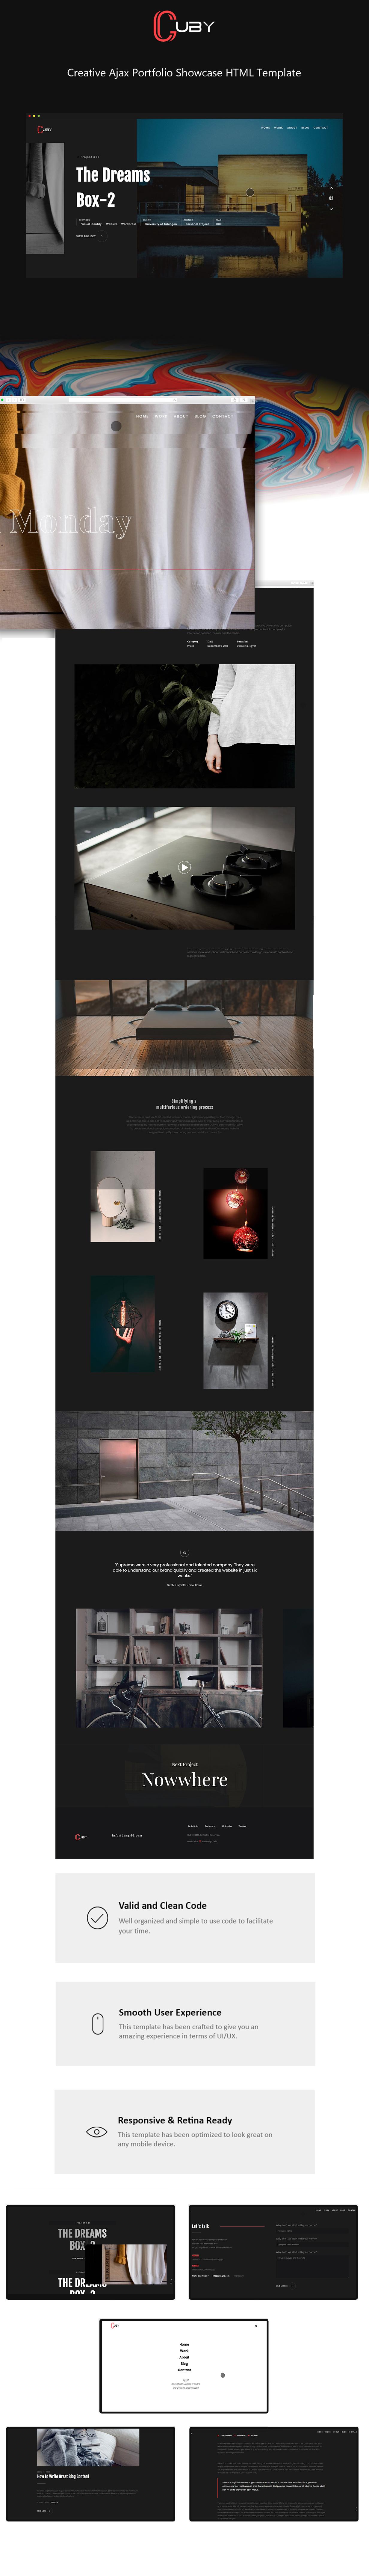 https://themeforest.net/item/cuby-portfolio-showcase-html-template/23066340?ref=dexignzone